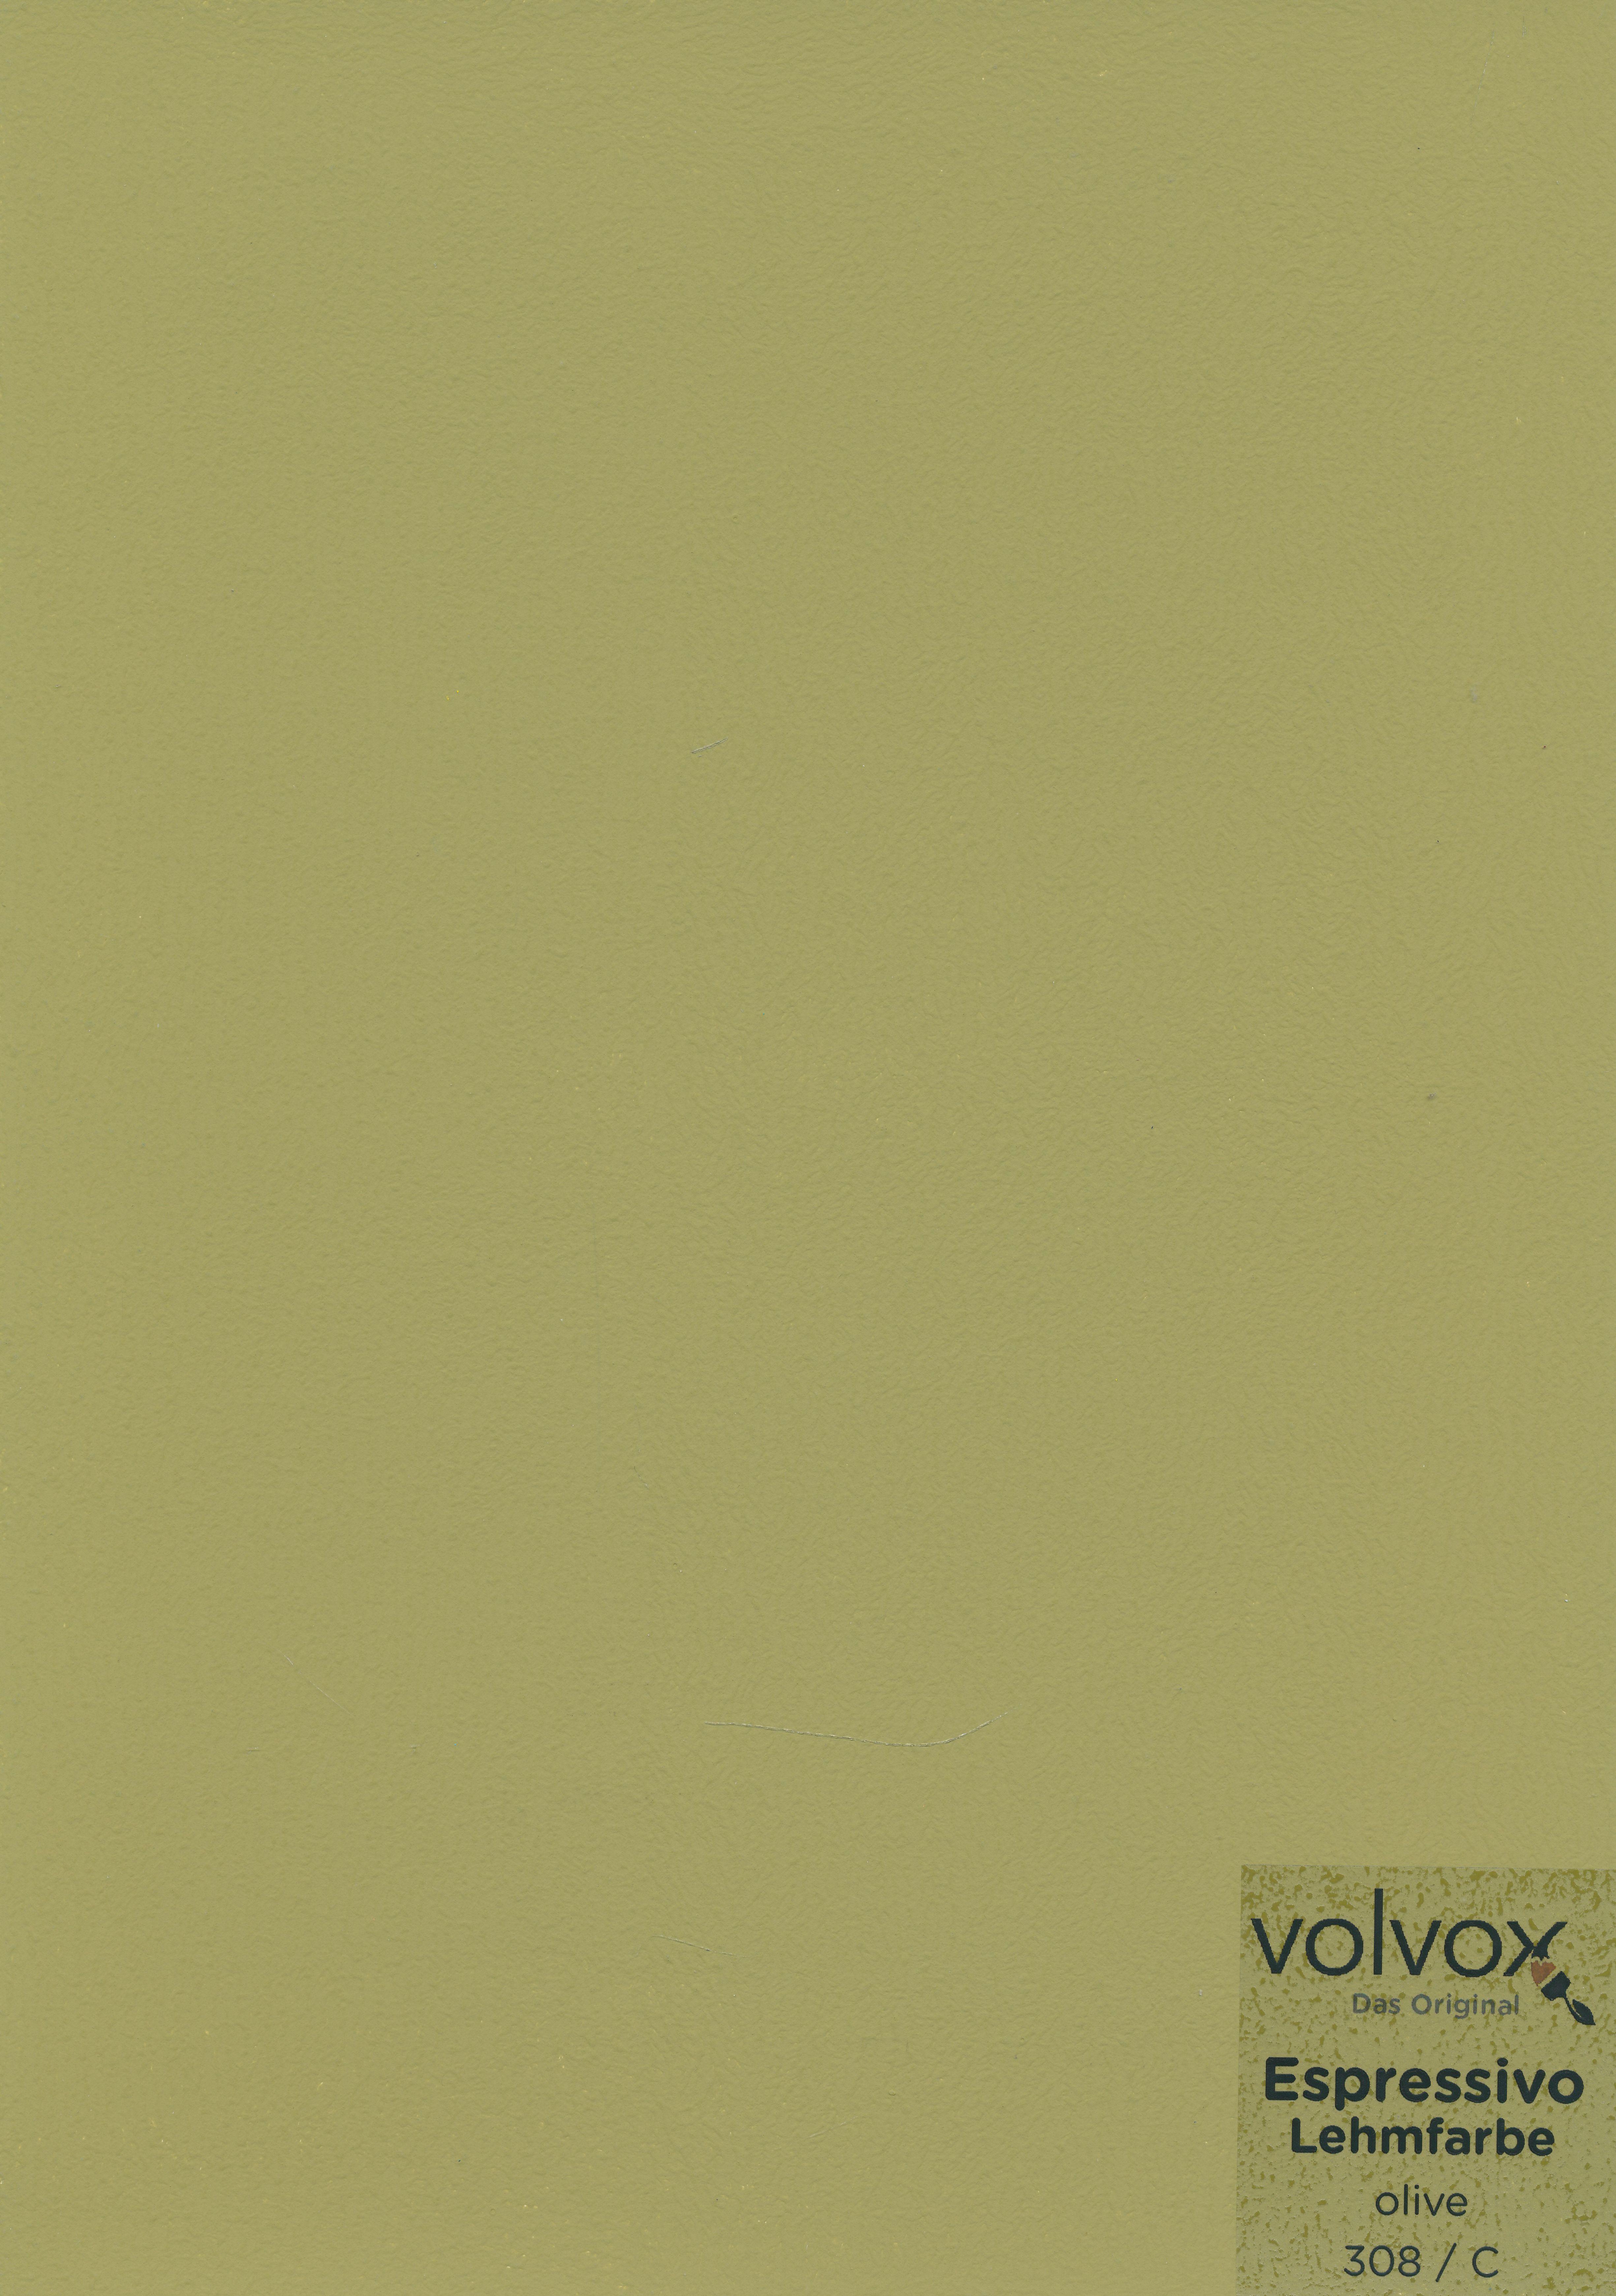 Volvox Espressivo Lehmfarbe 308 olive